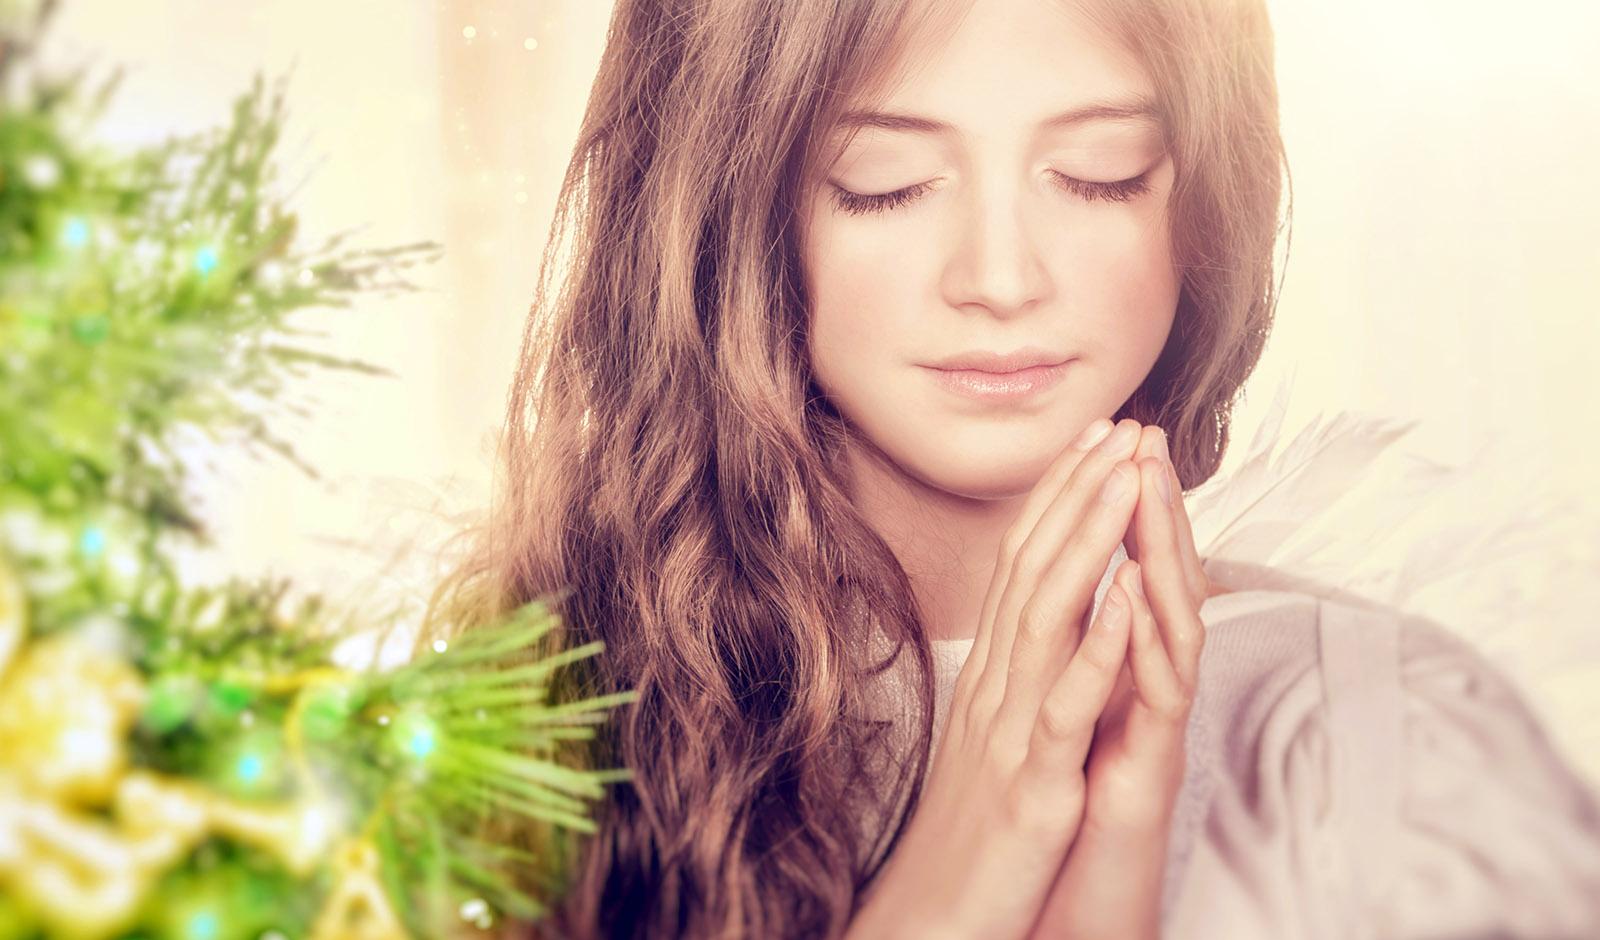 woman-praying-peace-belief-hope-spiritual